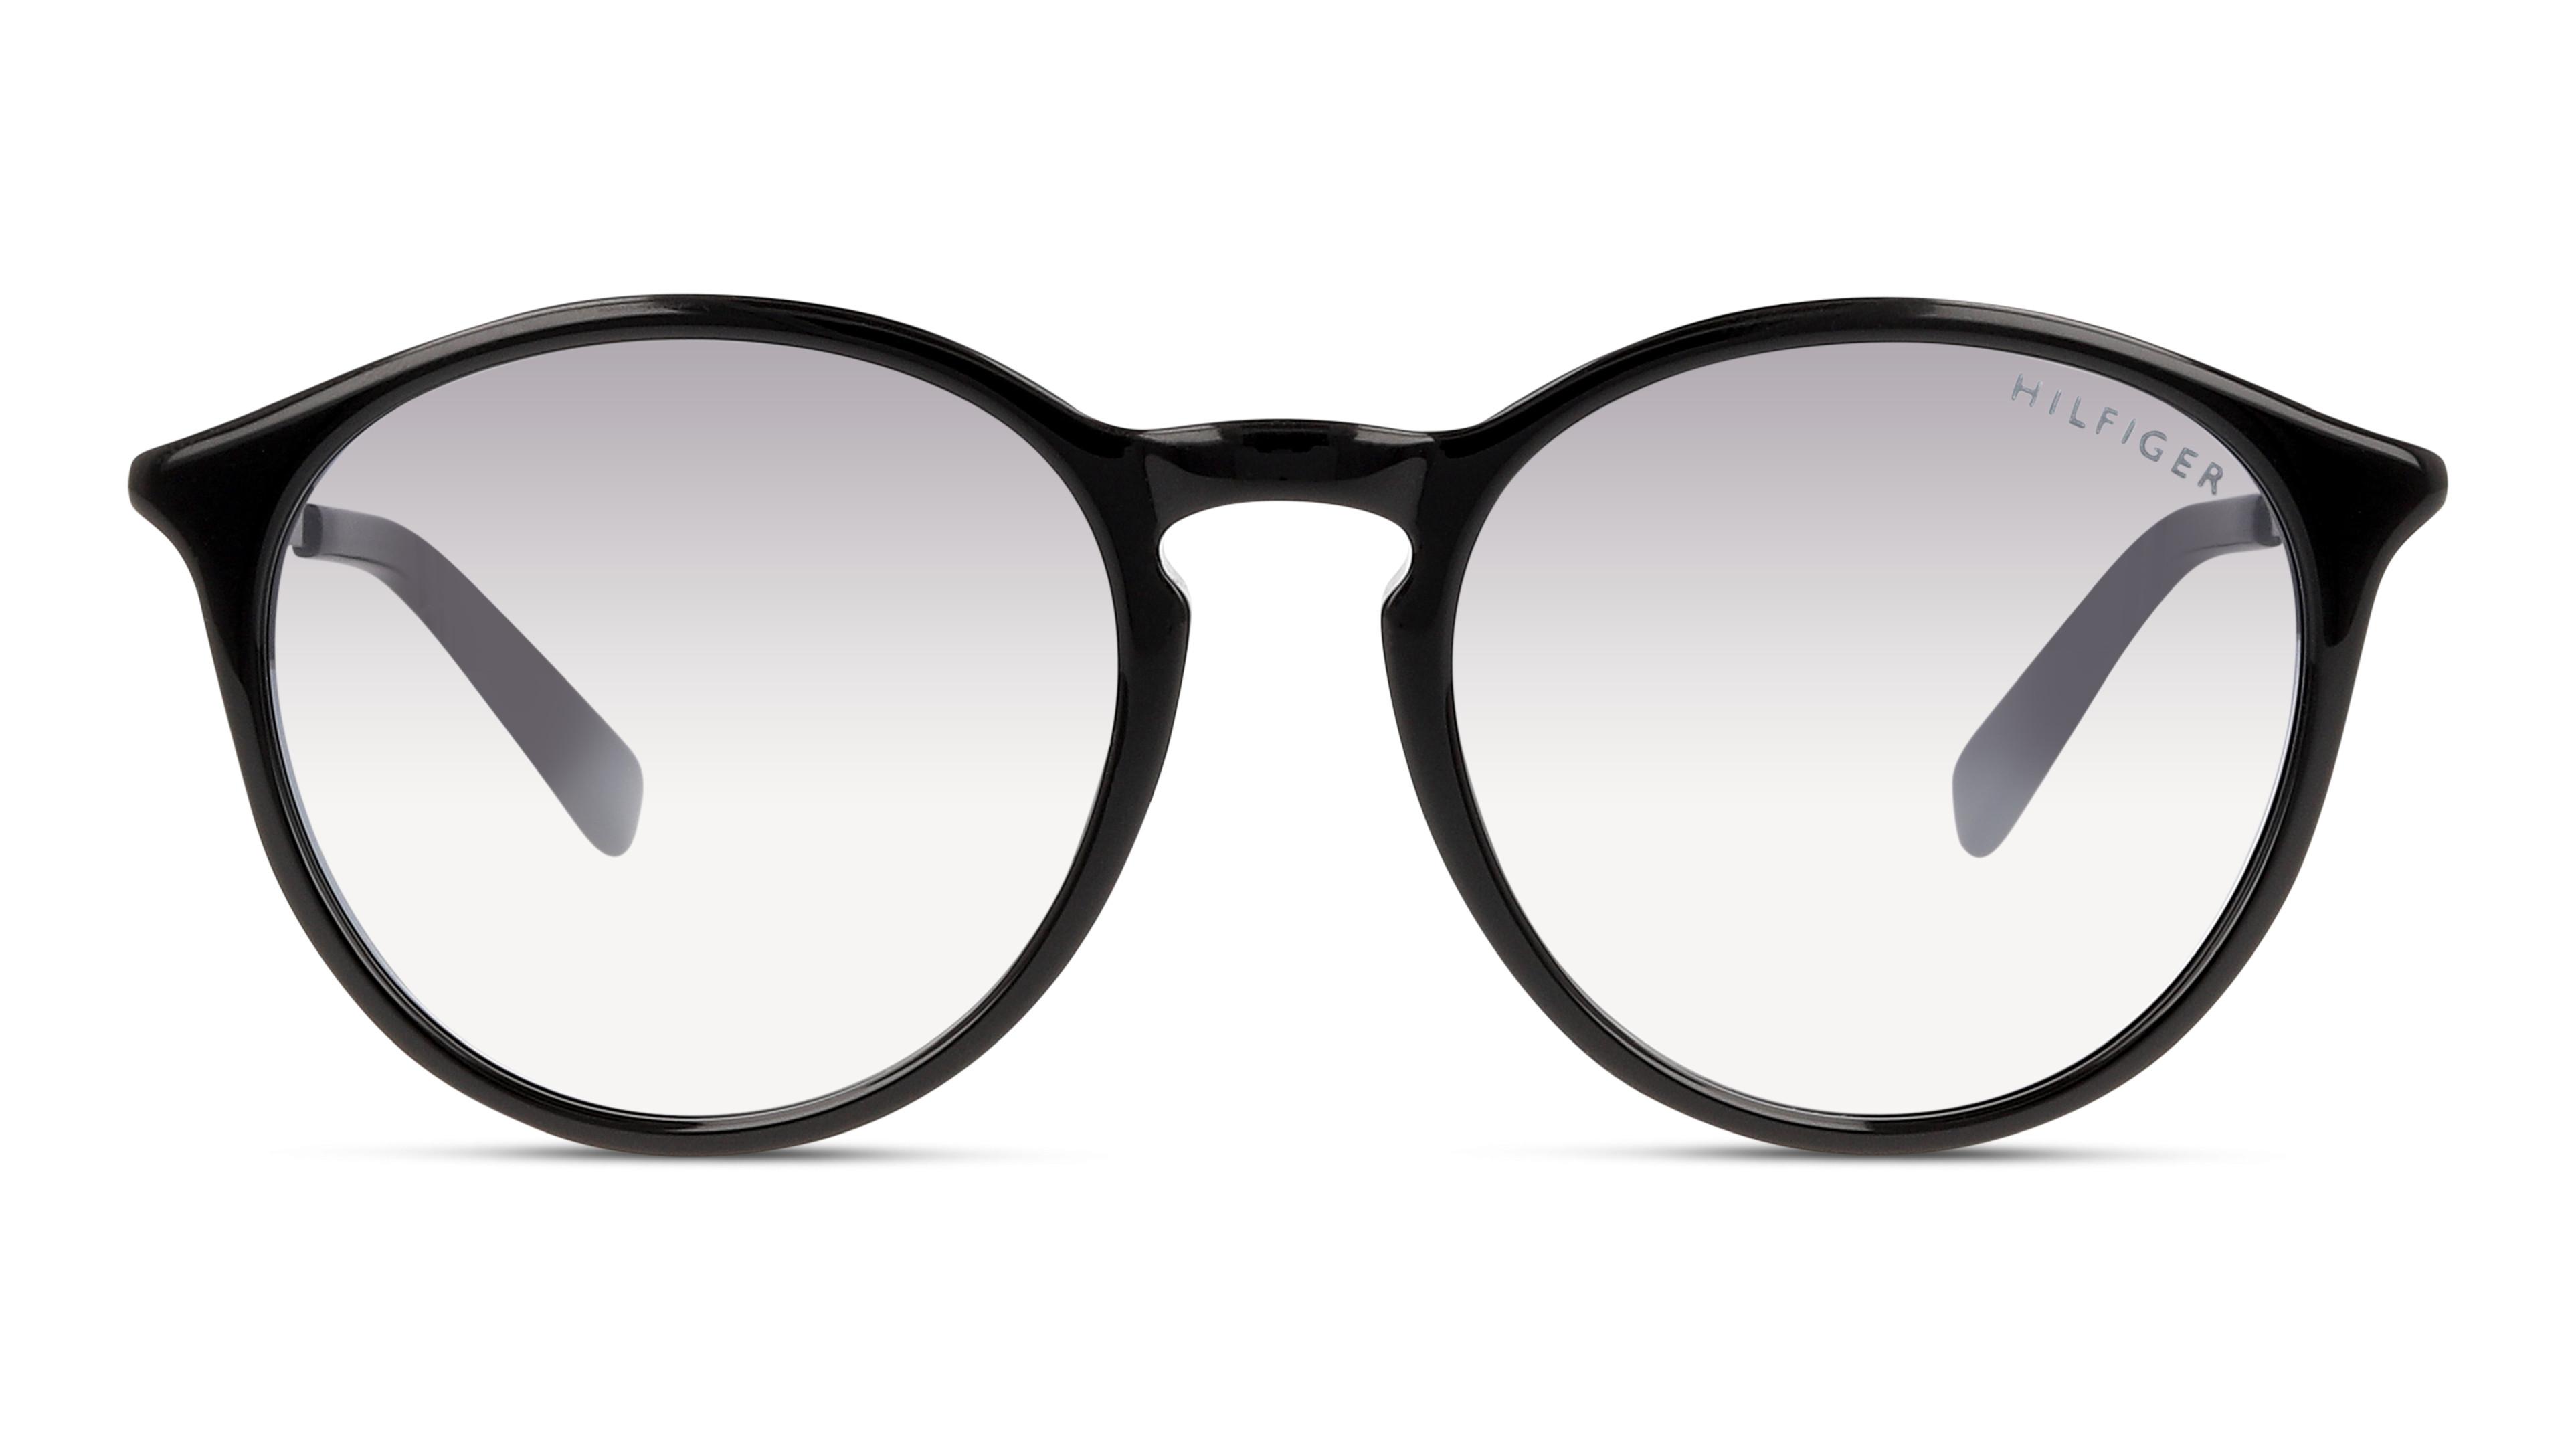 716736164663-front-01-tommy-hilfiger-th_1663_s-eyewear-black